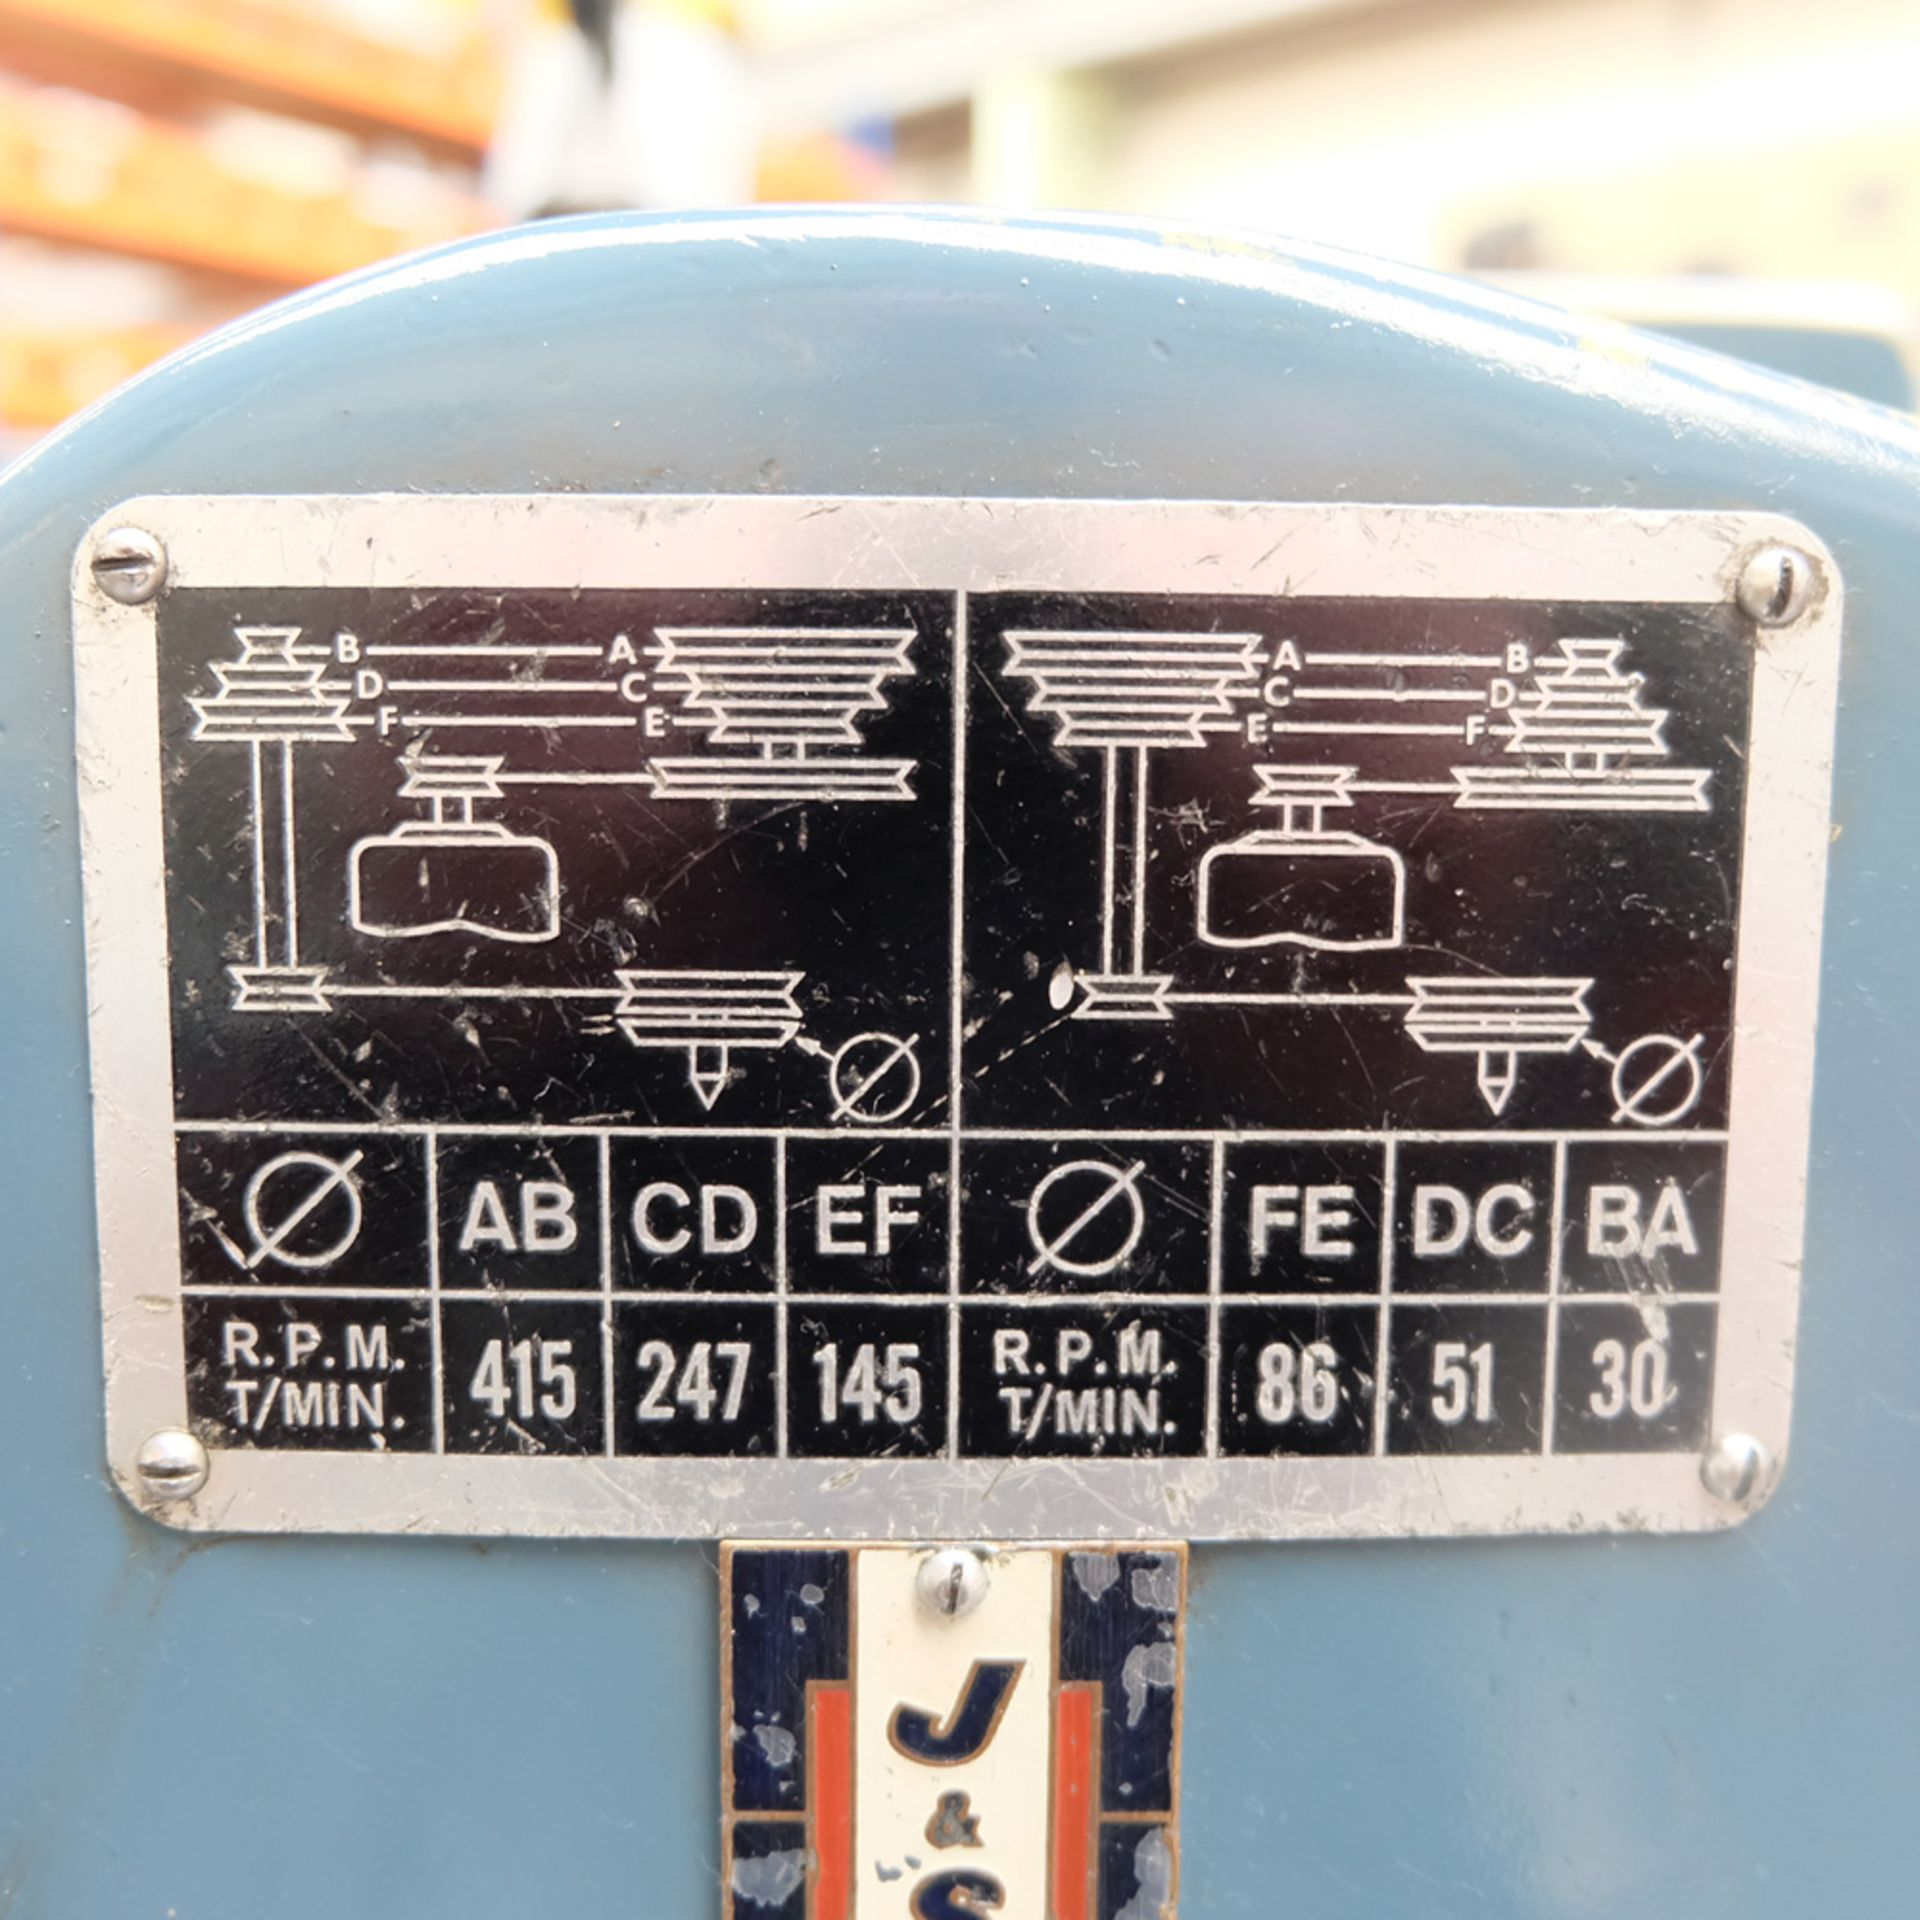 "Jones & Shipman Model 1310 EIU Universal Cylindrical Grinder. Capacity 18"" x 8"". - Image 10 of 11"